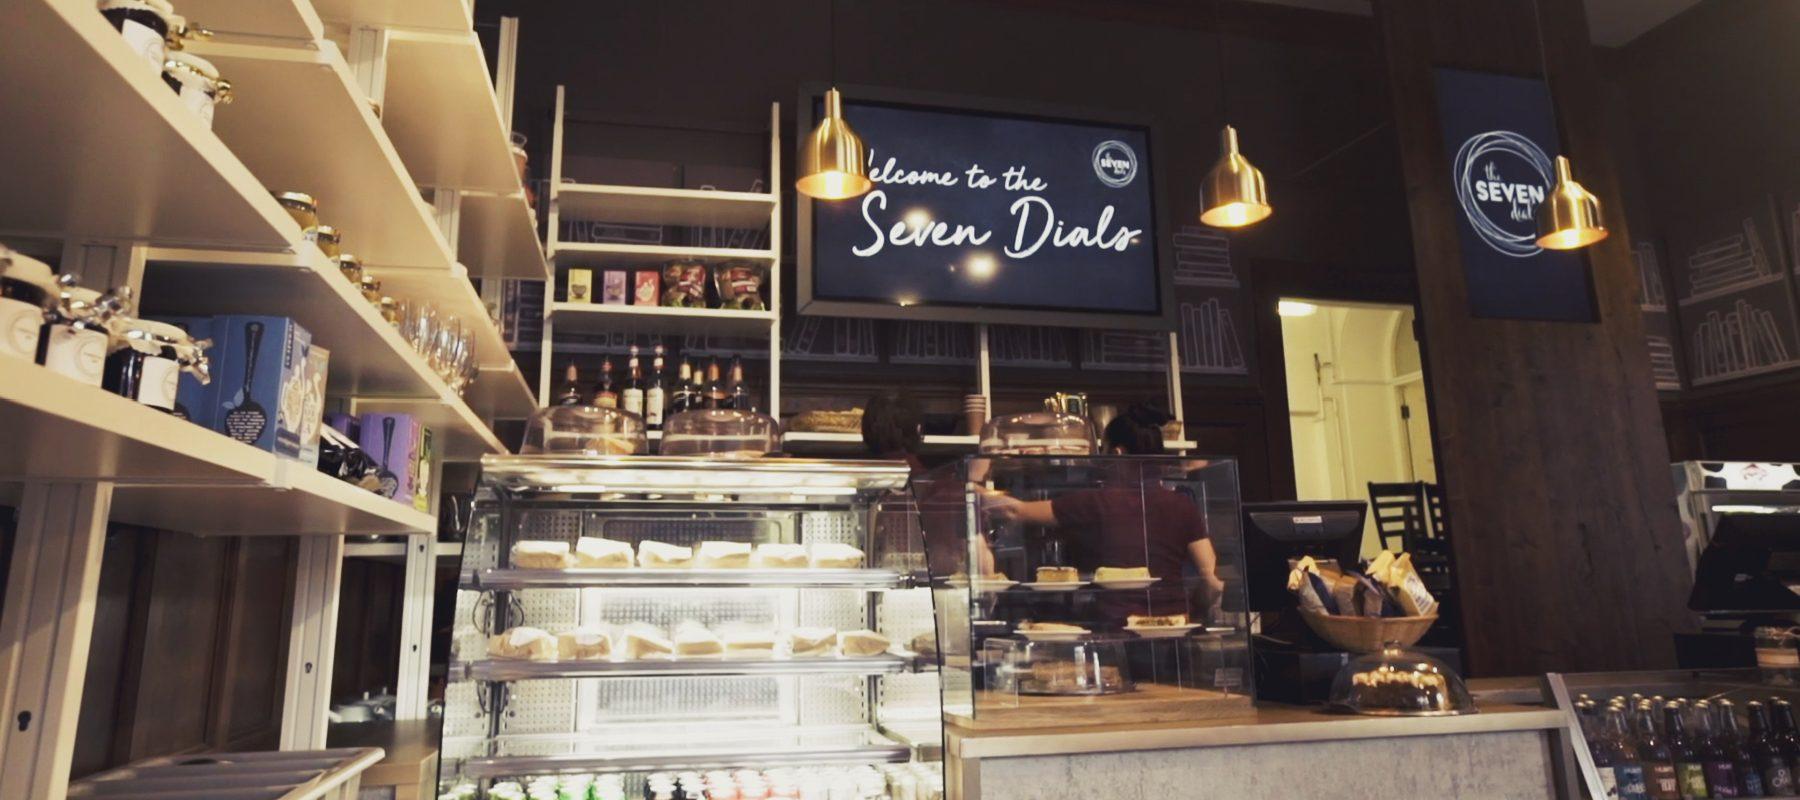 Digital Signage solution for The Seven Dials Cafe